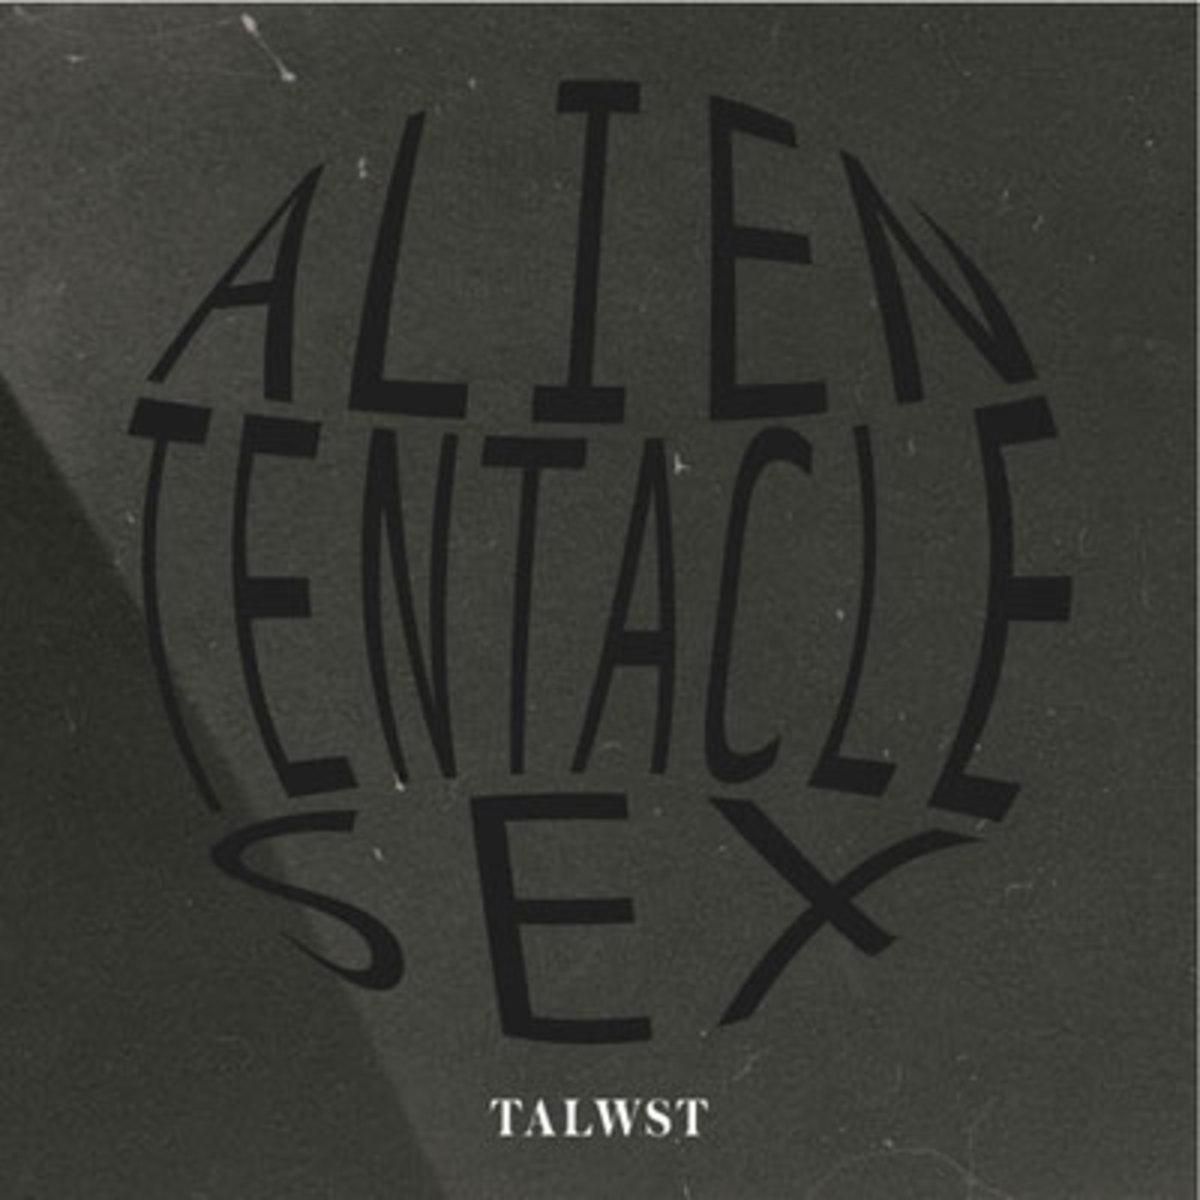 talwst-alientenacle.jpg